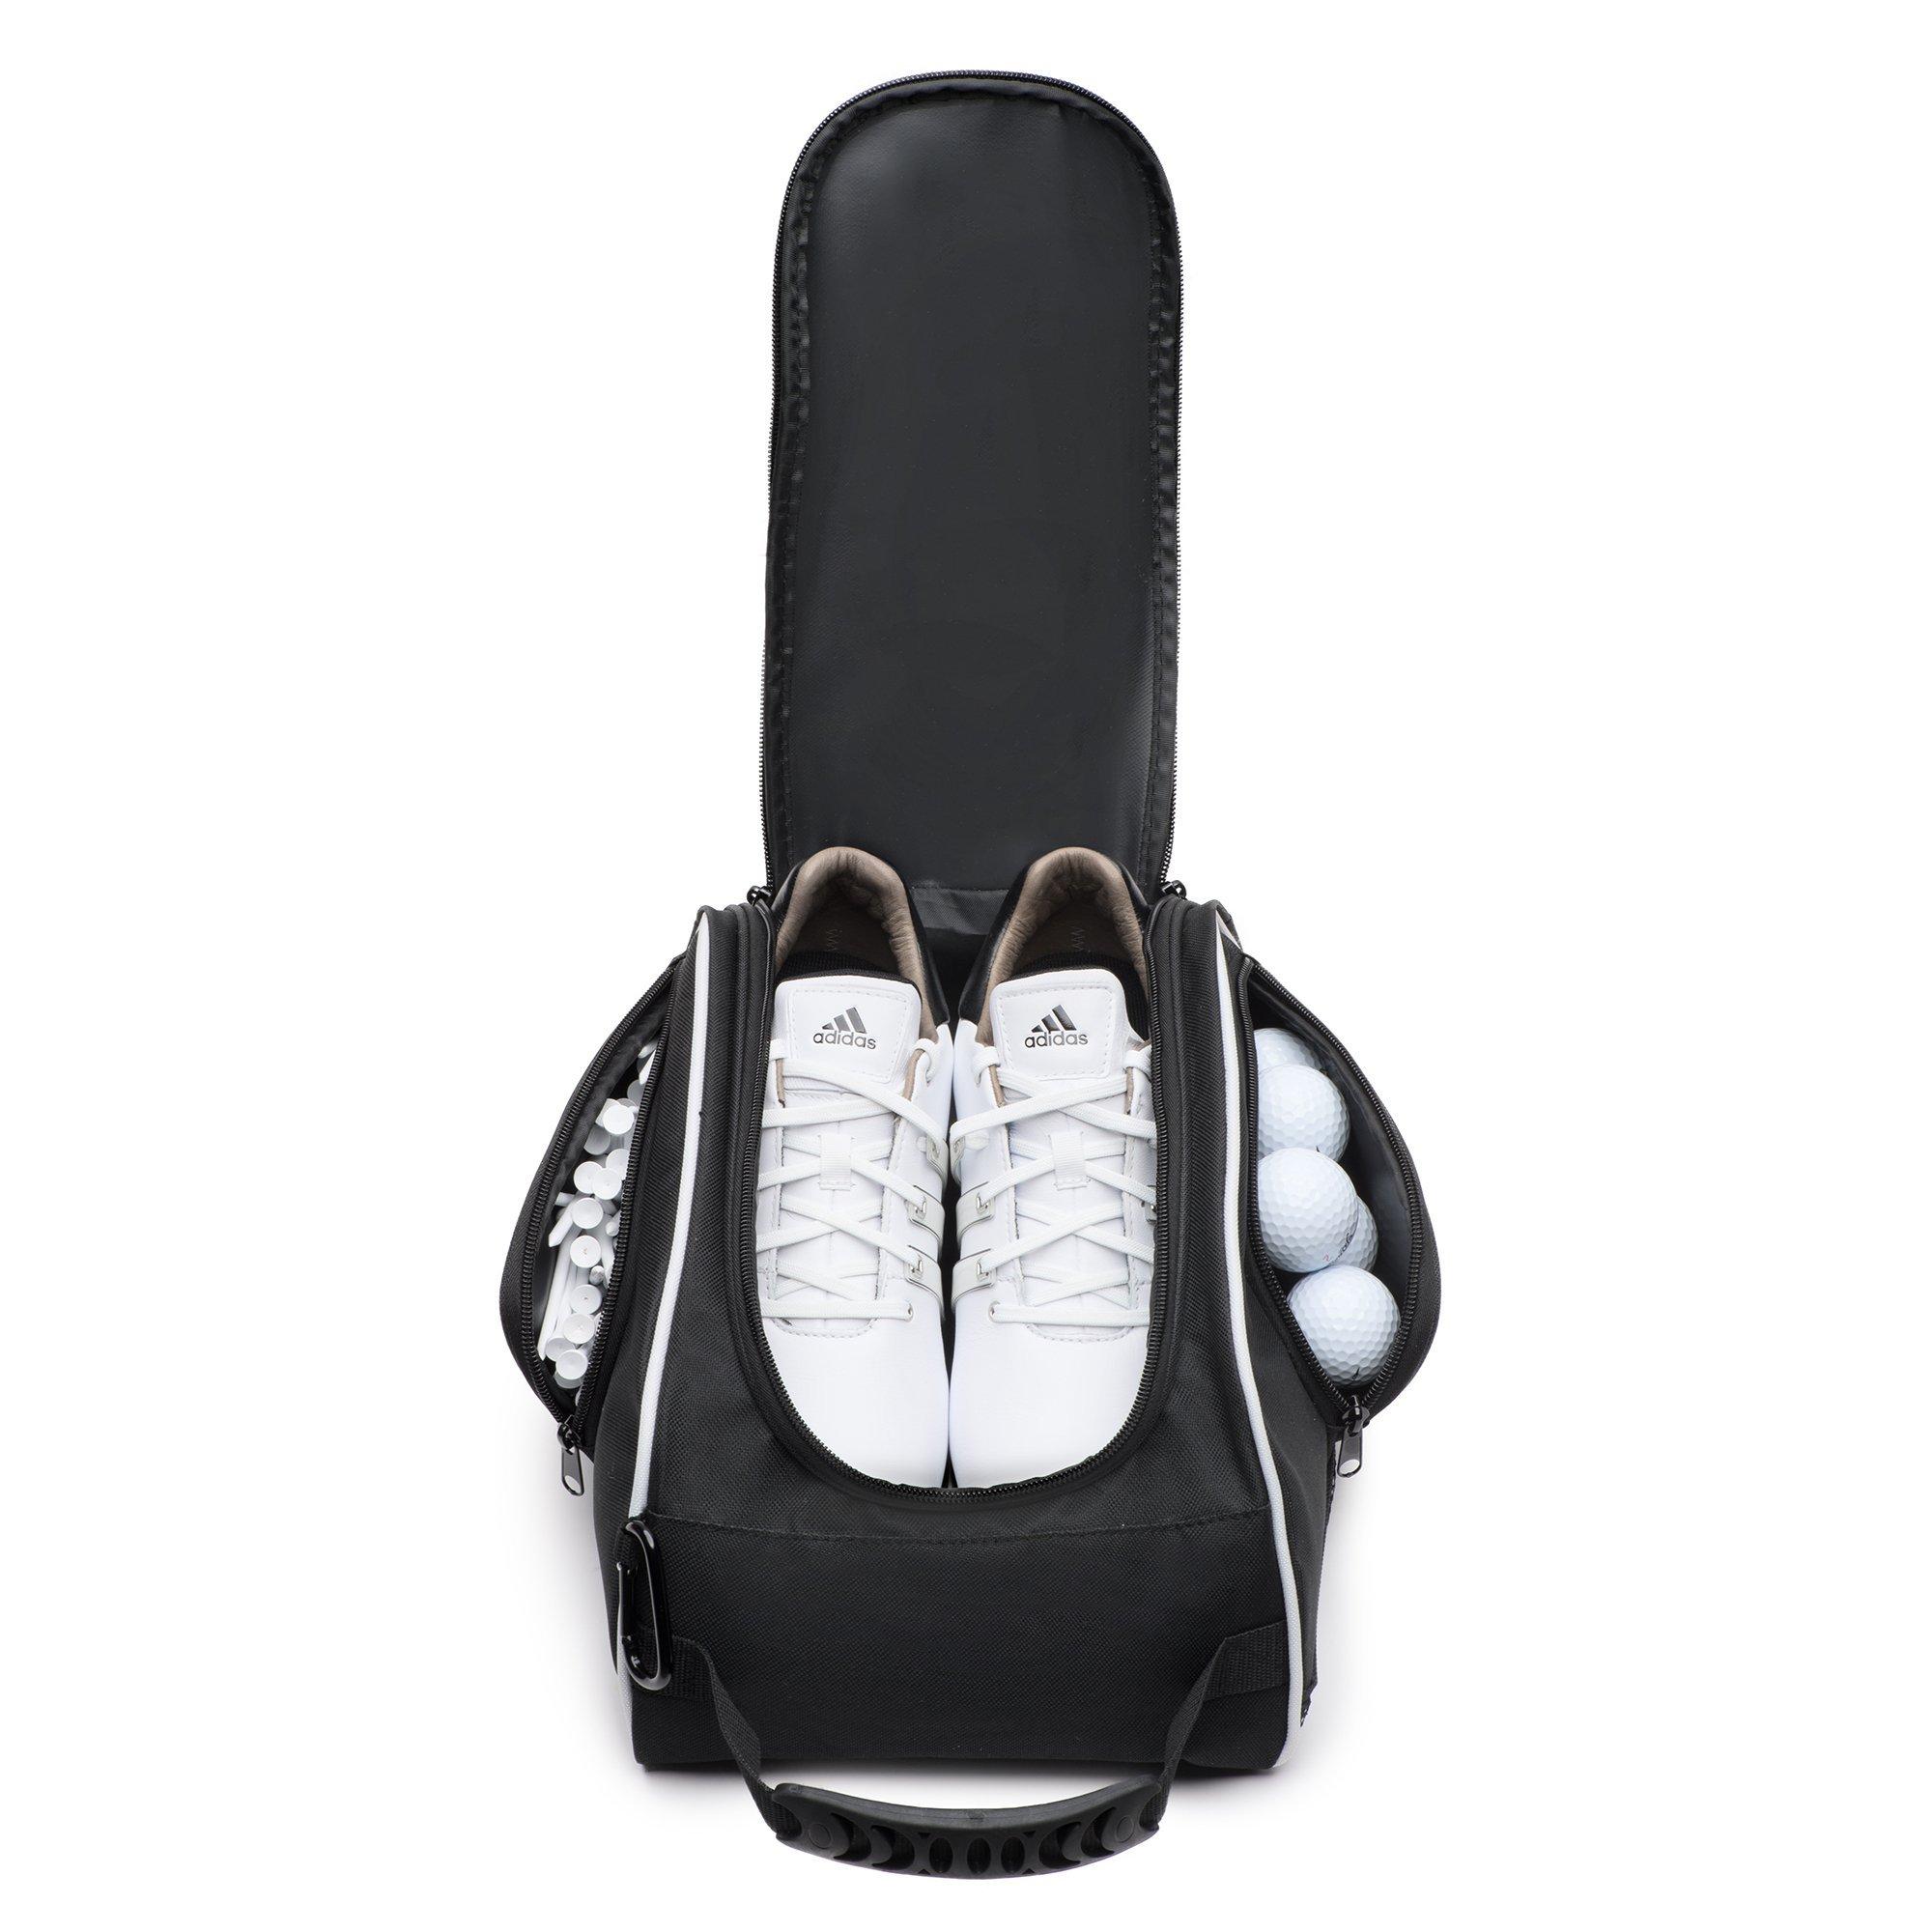 DesignWorks Golf Shoe Bag Tote for Men and Women, Hanging Clip and Large Zippered Side-Pockets, includes Golf Accessories Bonus by DesignWorks (Image #3)